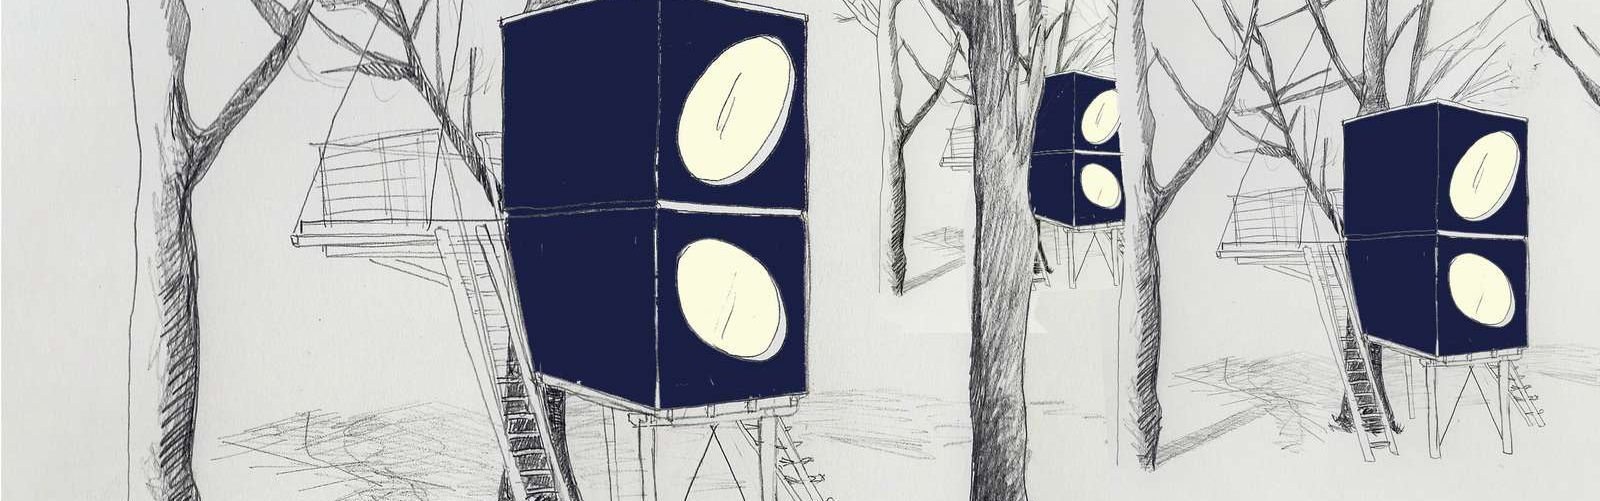 11592015 – Treehouses